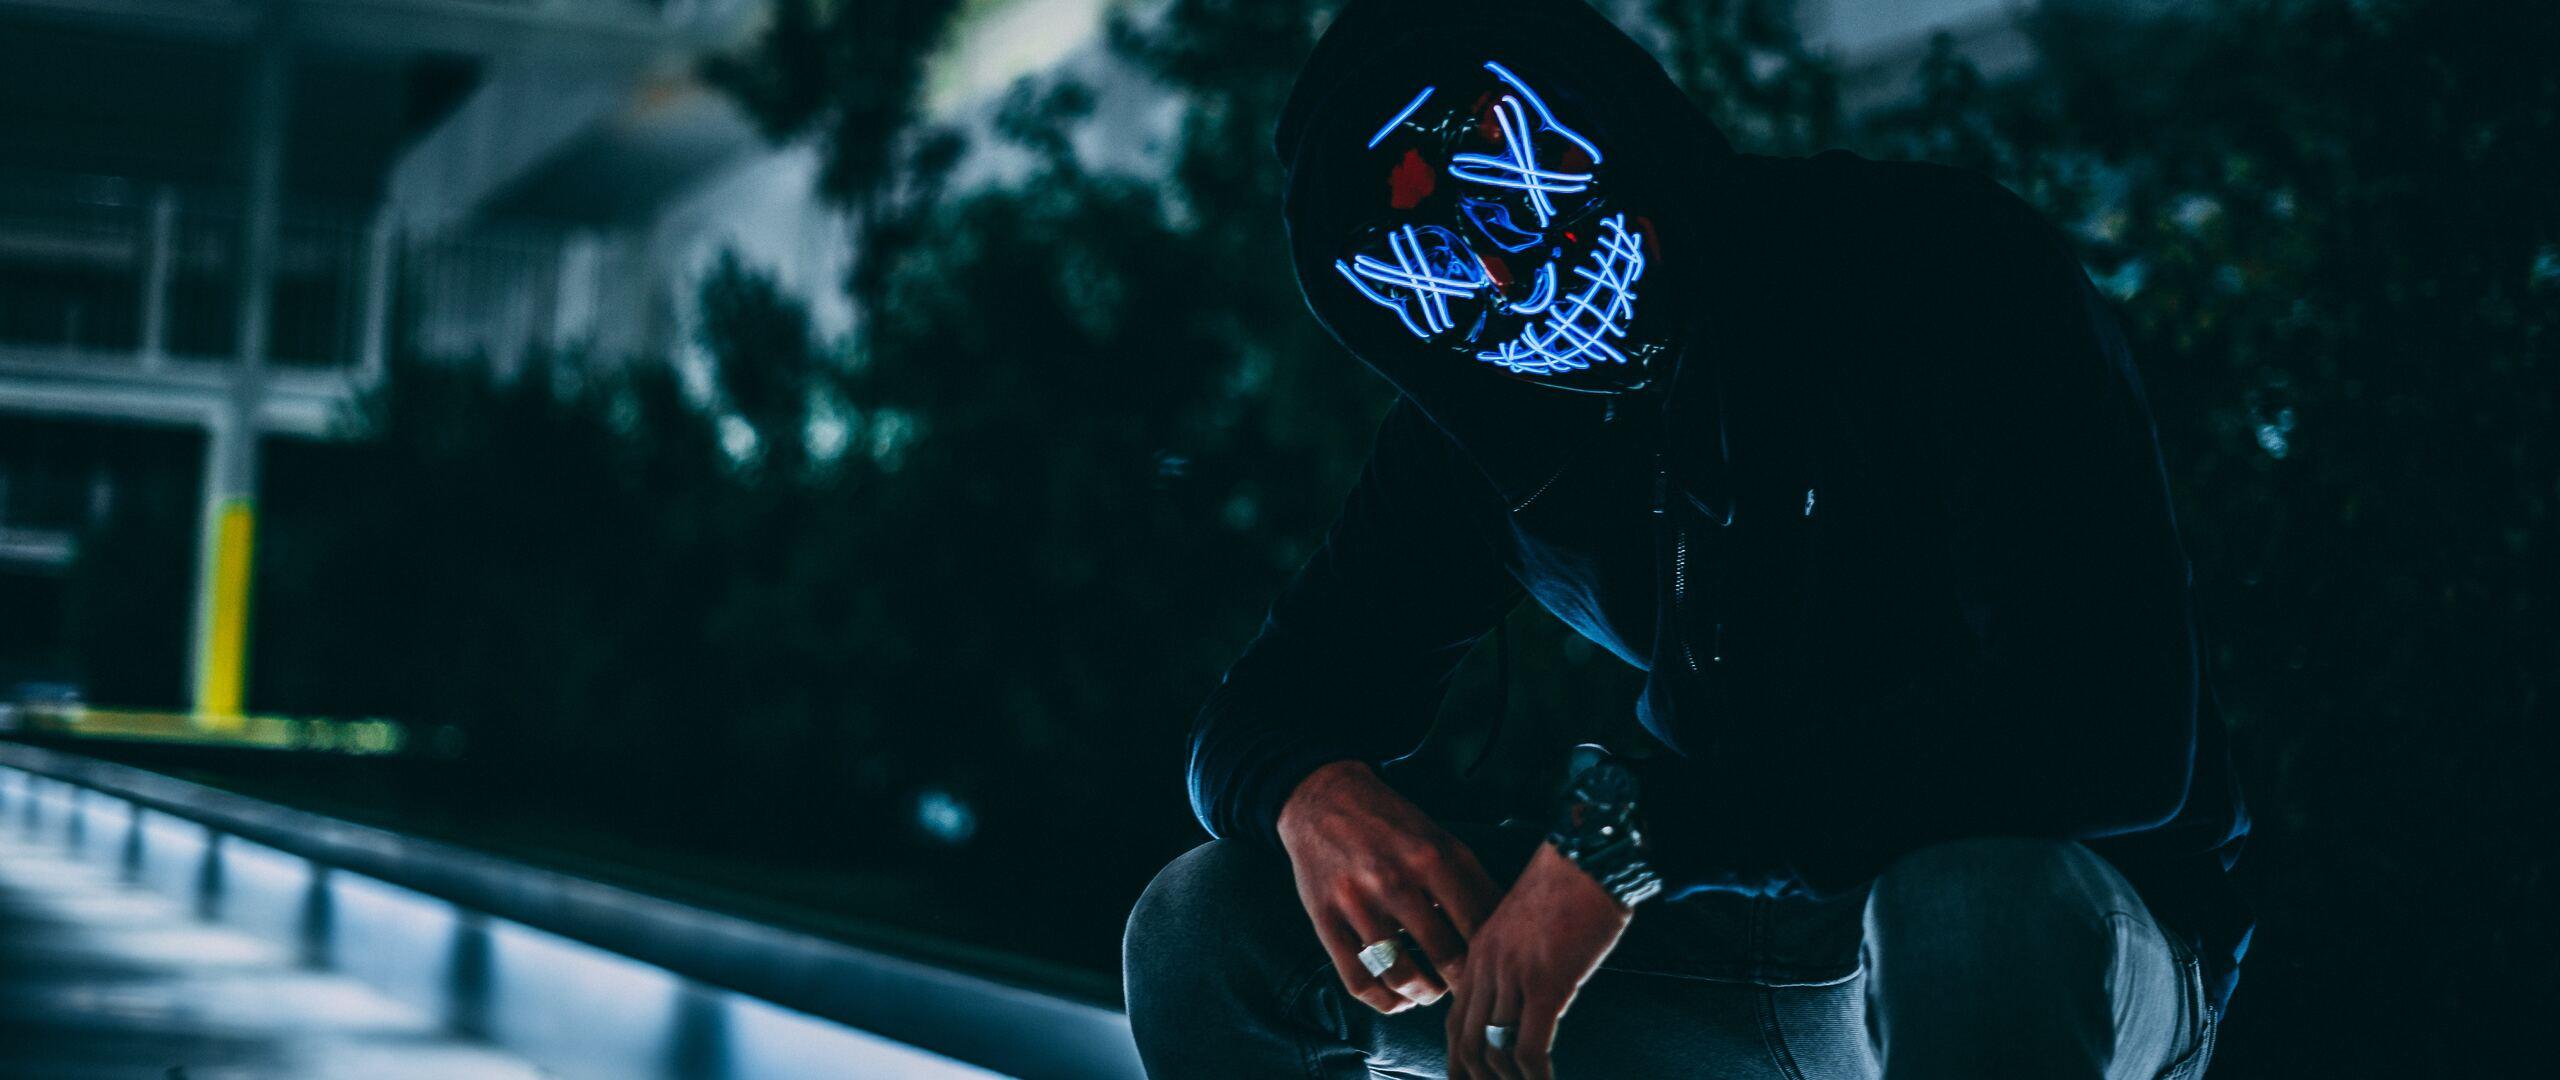 mask-anonymous-hoodie-guy-i4.jpg